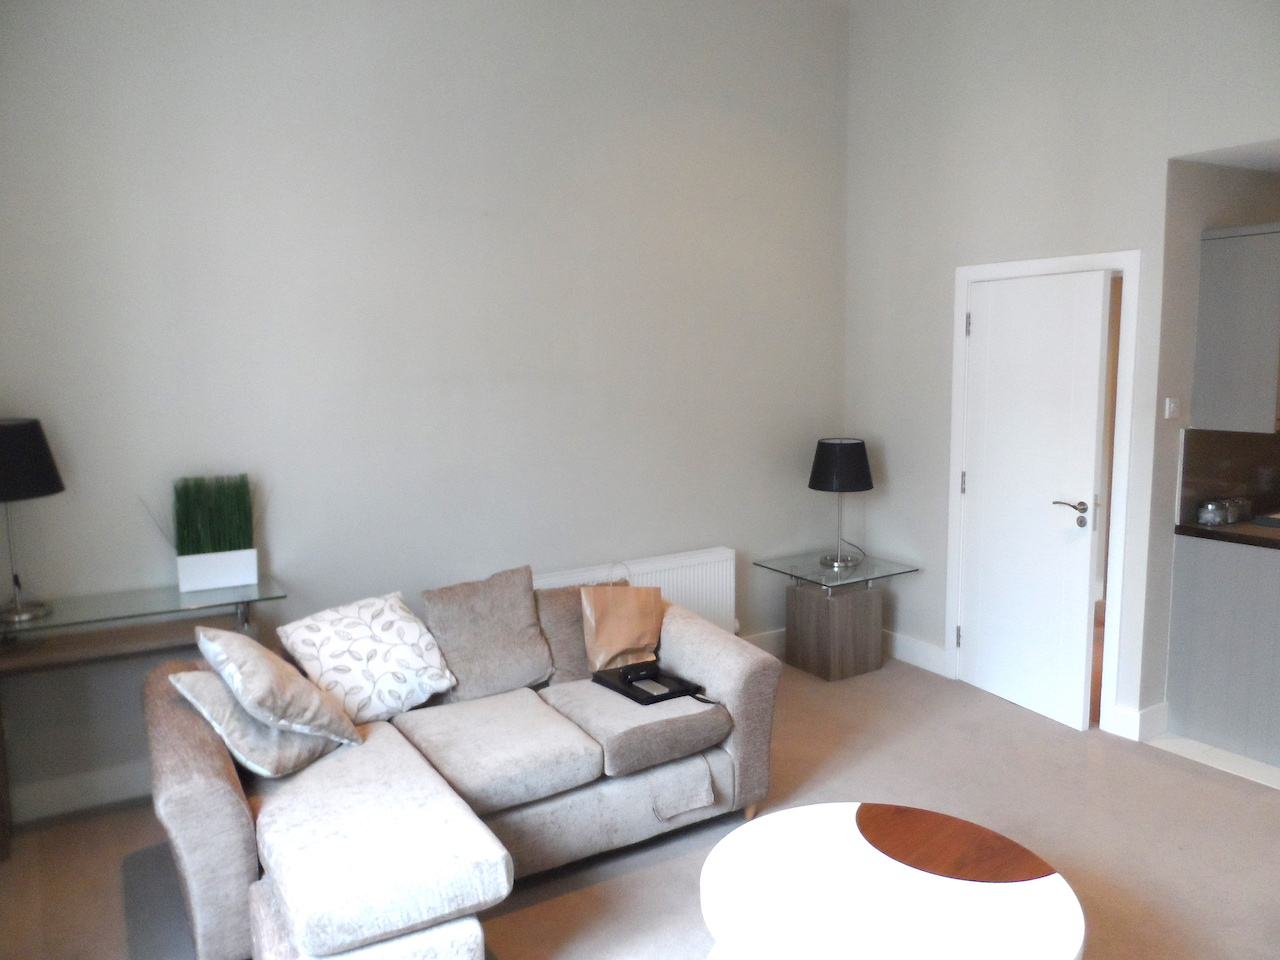 26 Castle St, Dalkey, Co. Dublin, Ireland – Luxury 2 Double Bedroom Apartment